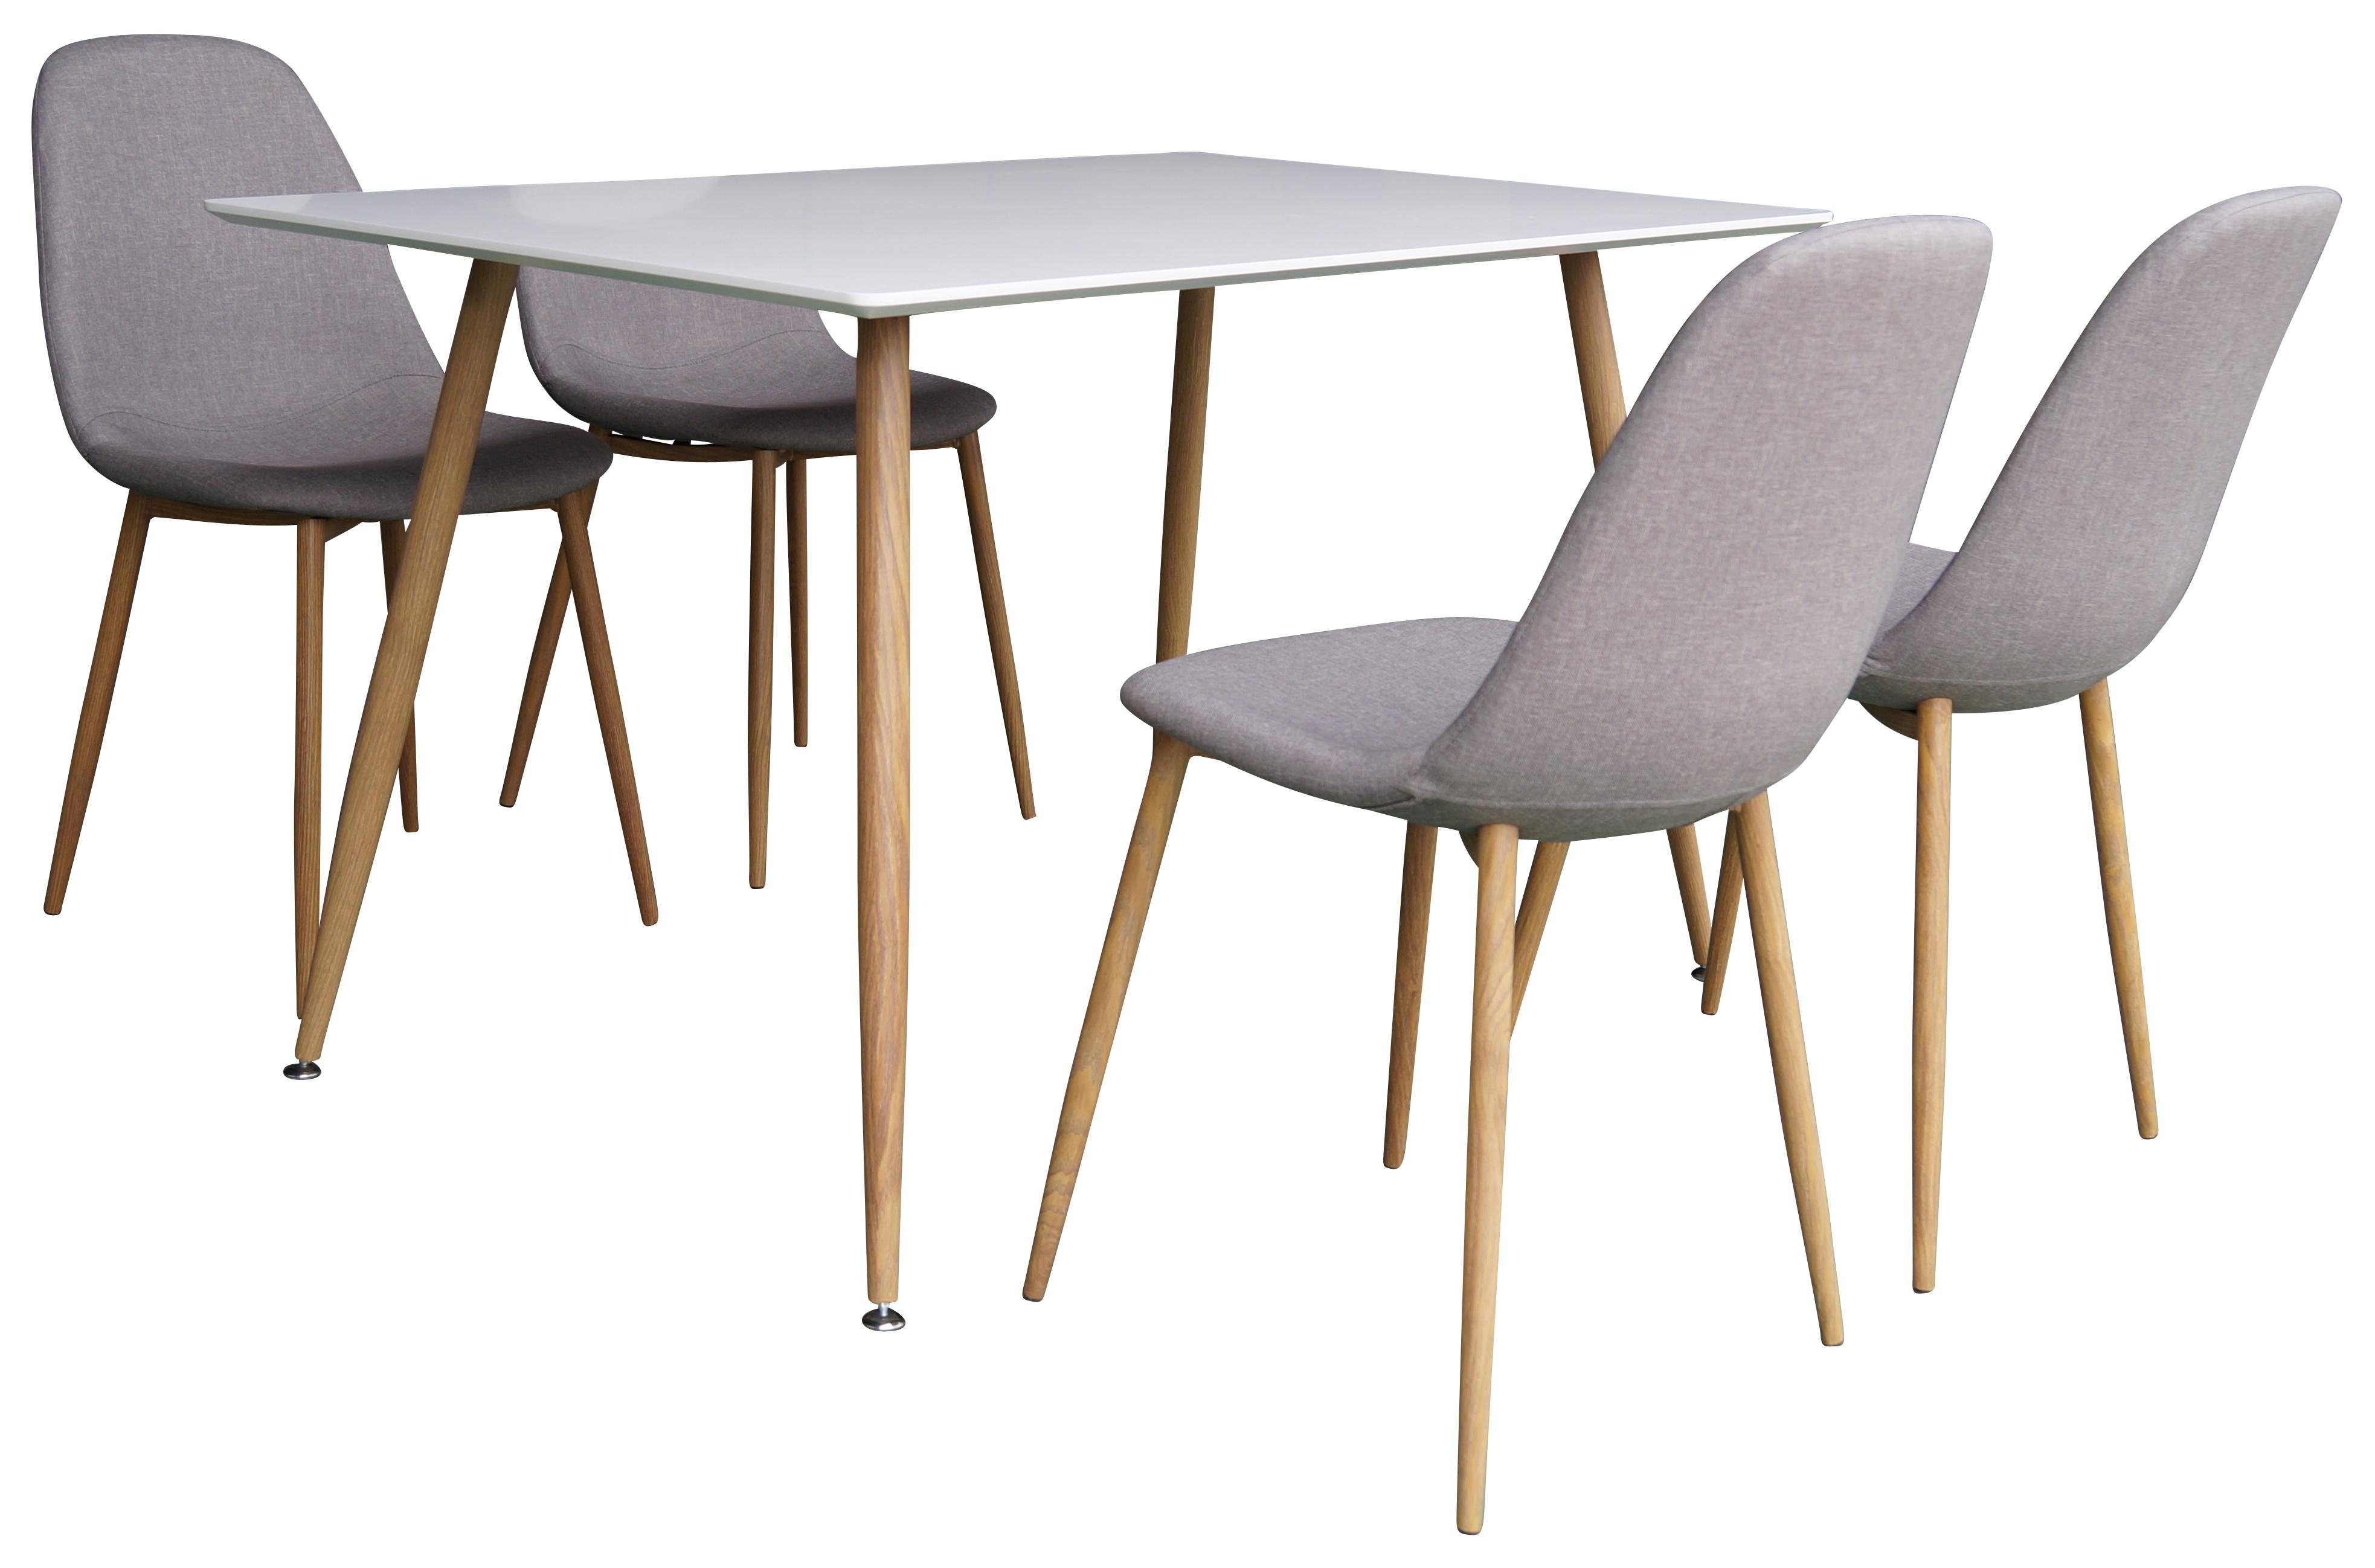 Polar White matbord 120 cm med 4 st Polar Dining Chair Grey/Oak